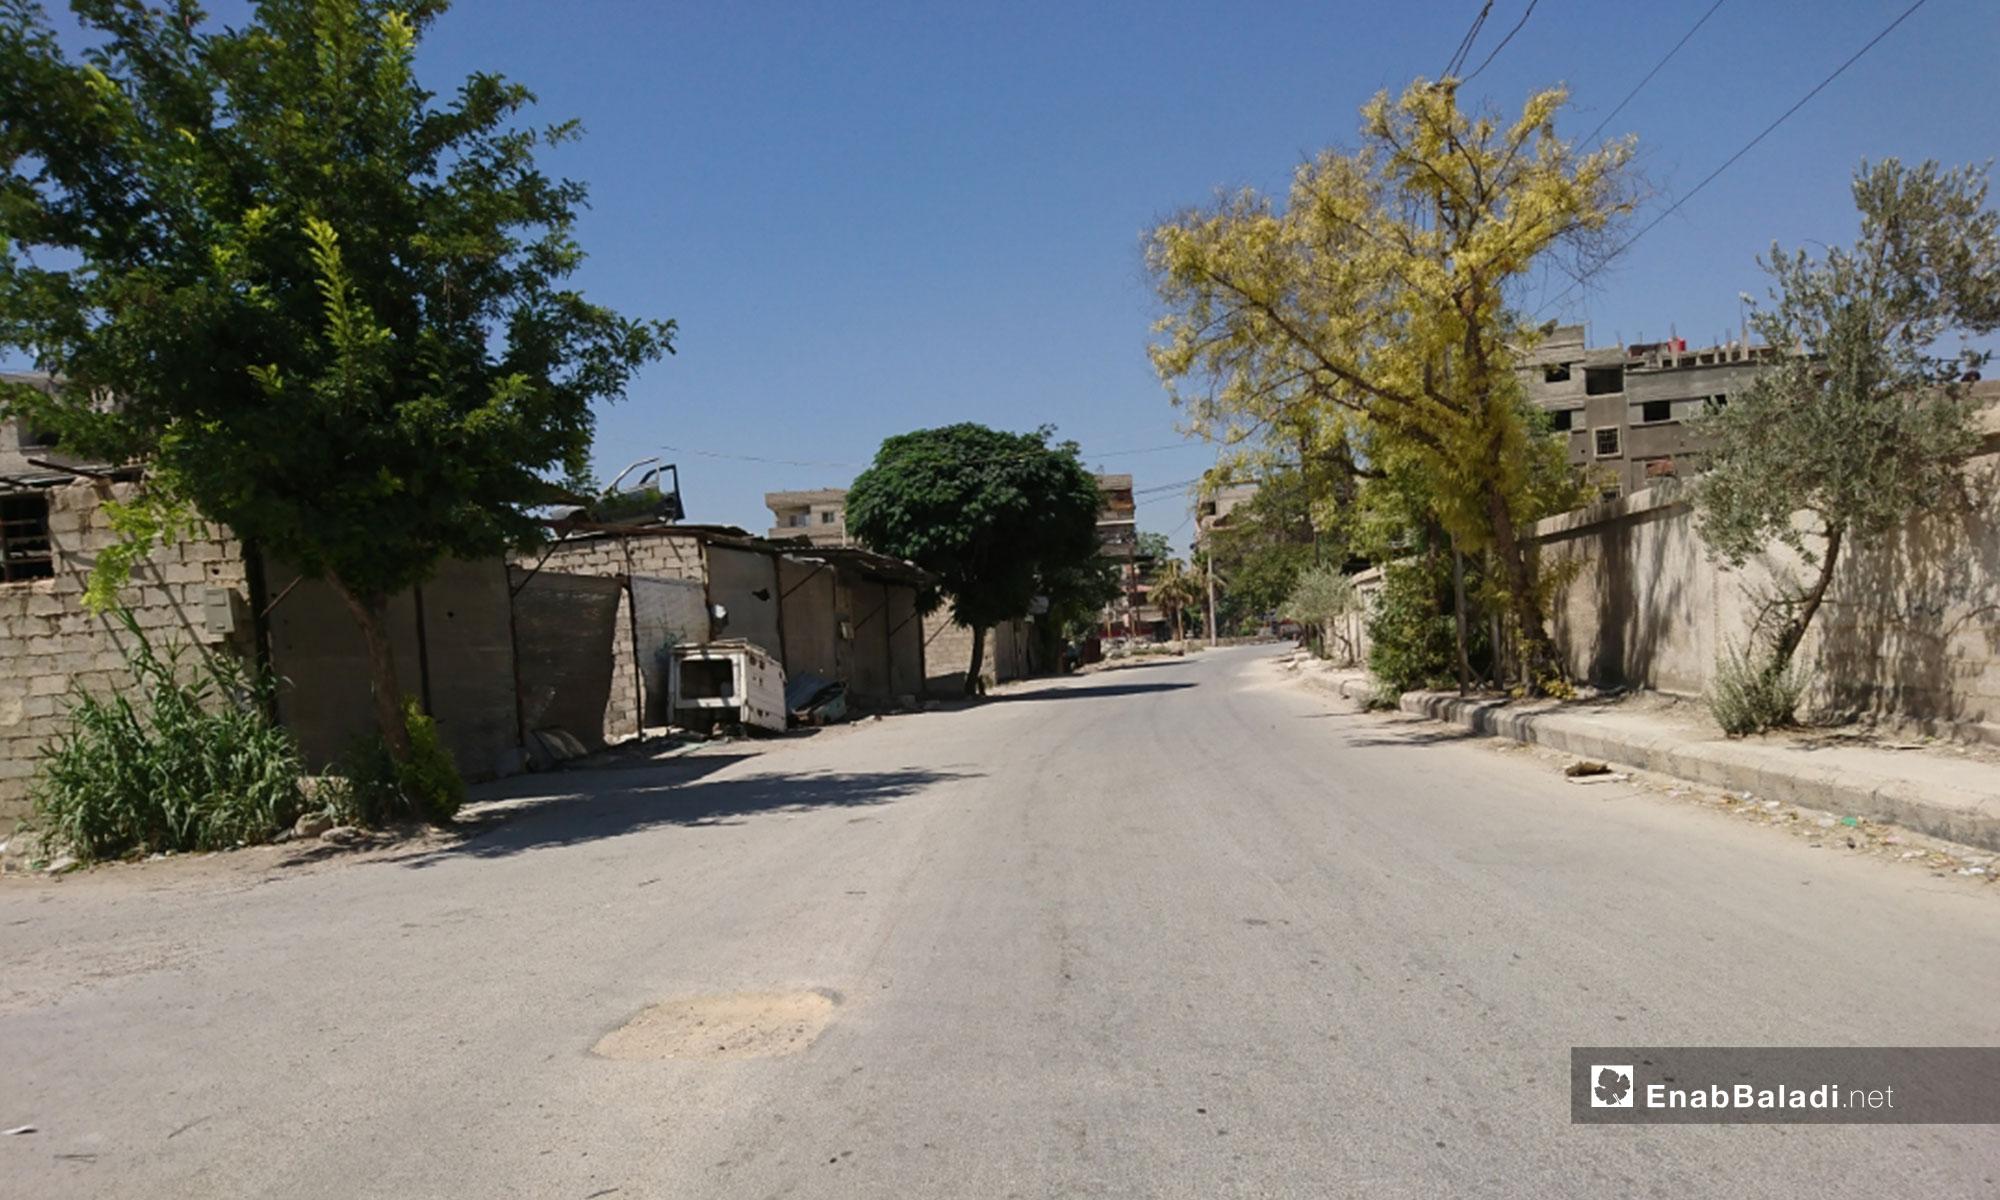 The main road in Kafr Batna town, Eastern Ghouta – August 13, 2018 (Enab Baladi)